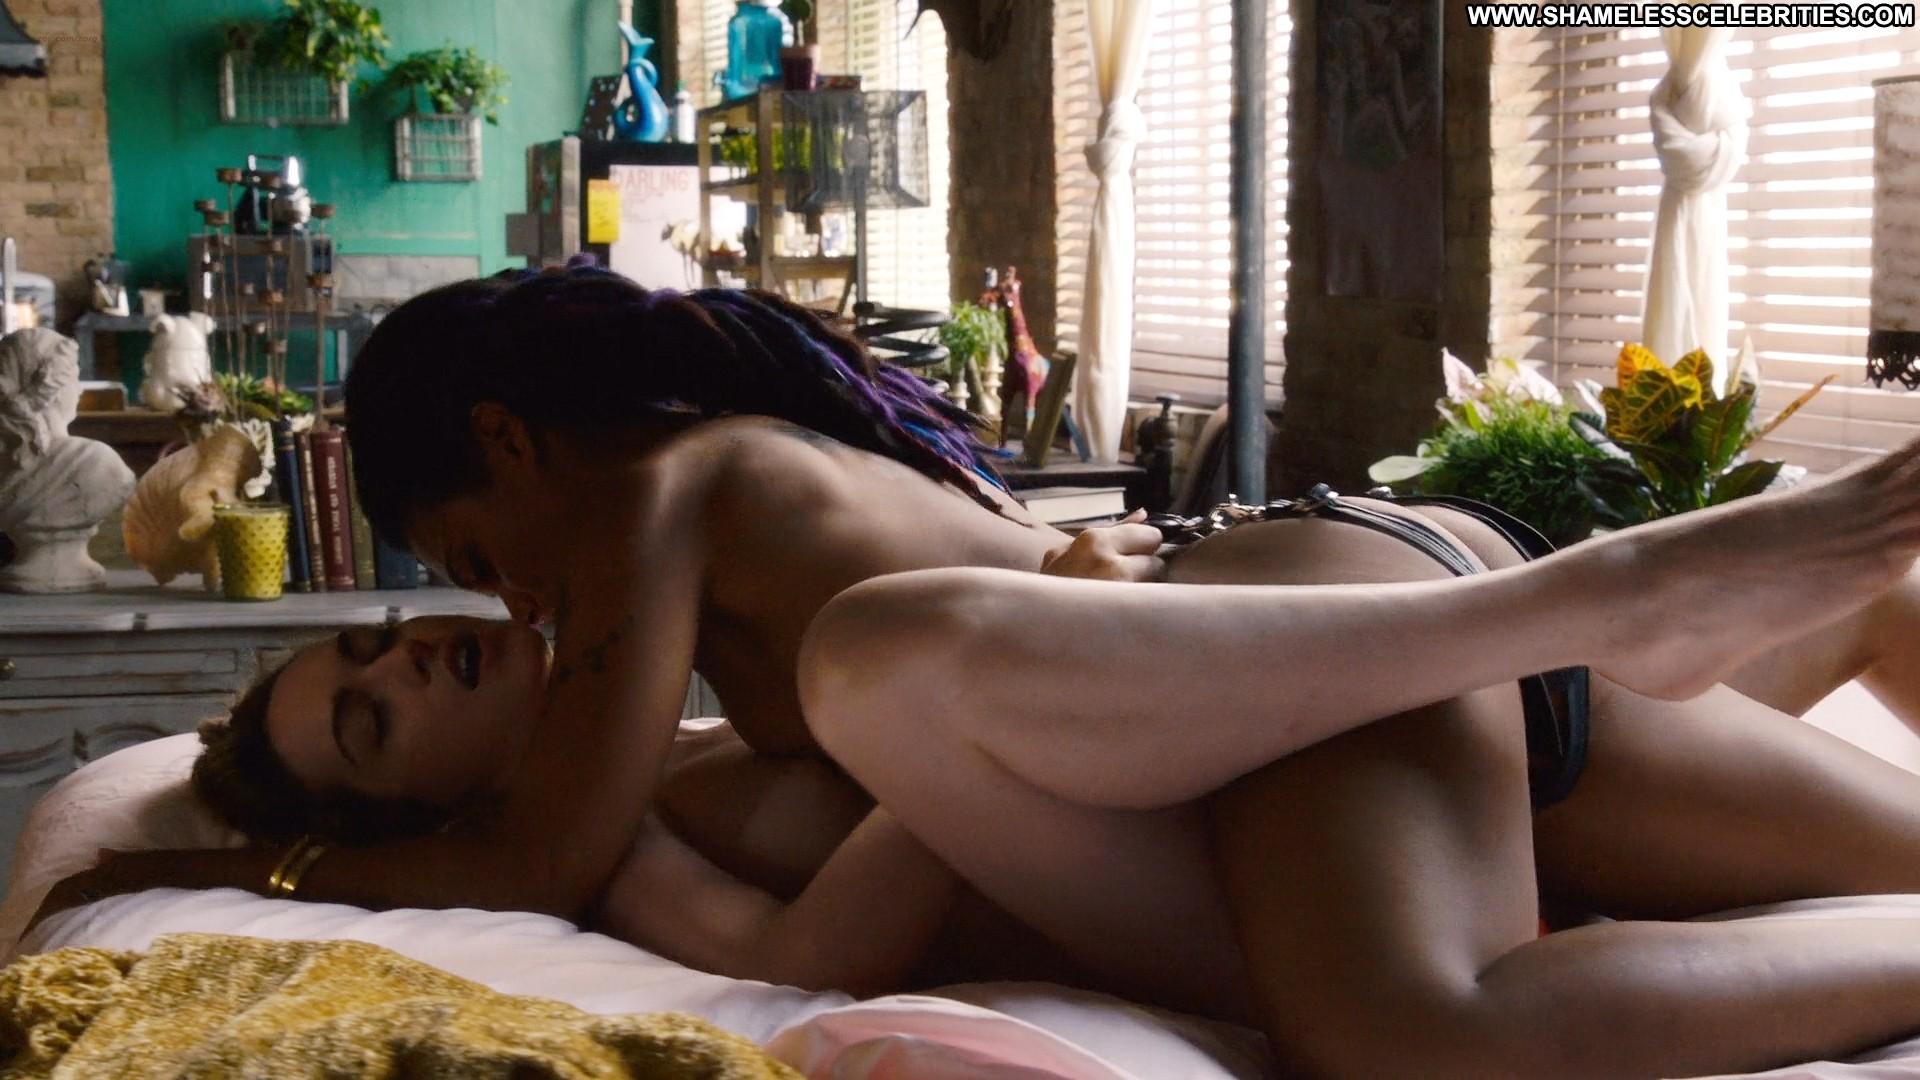 Freema ageyman nude